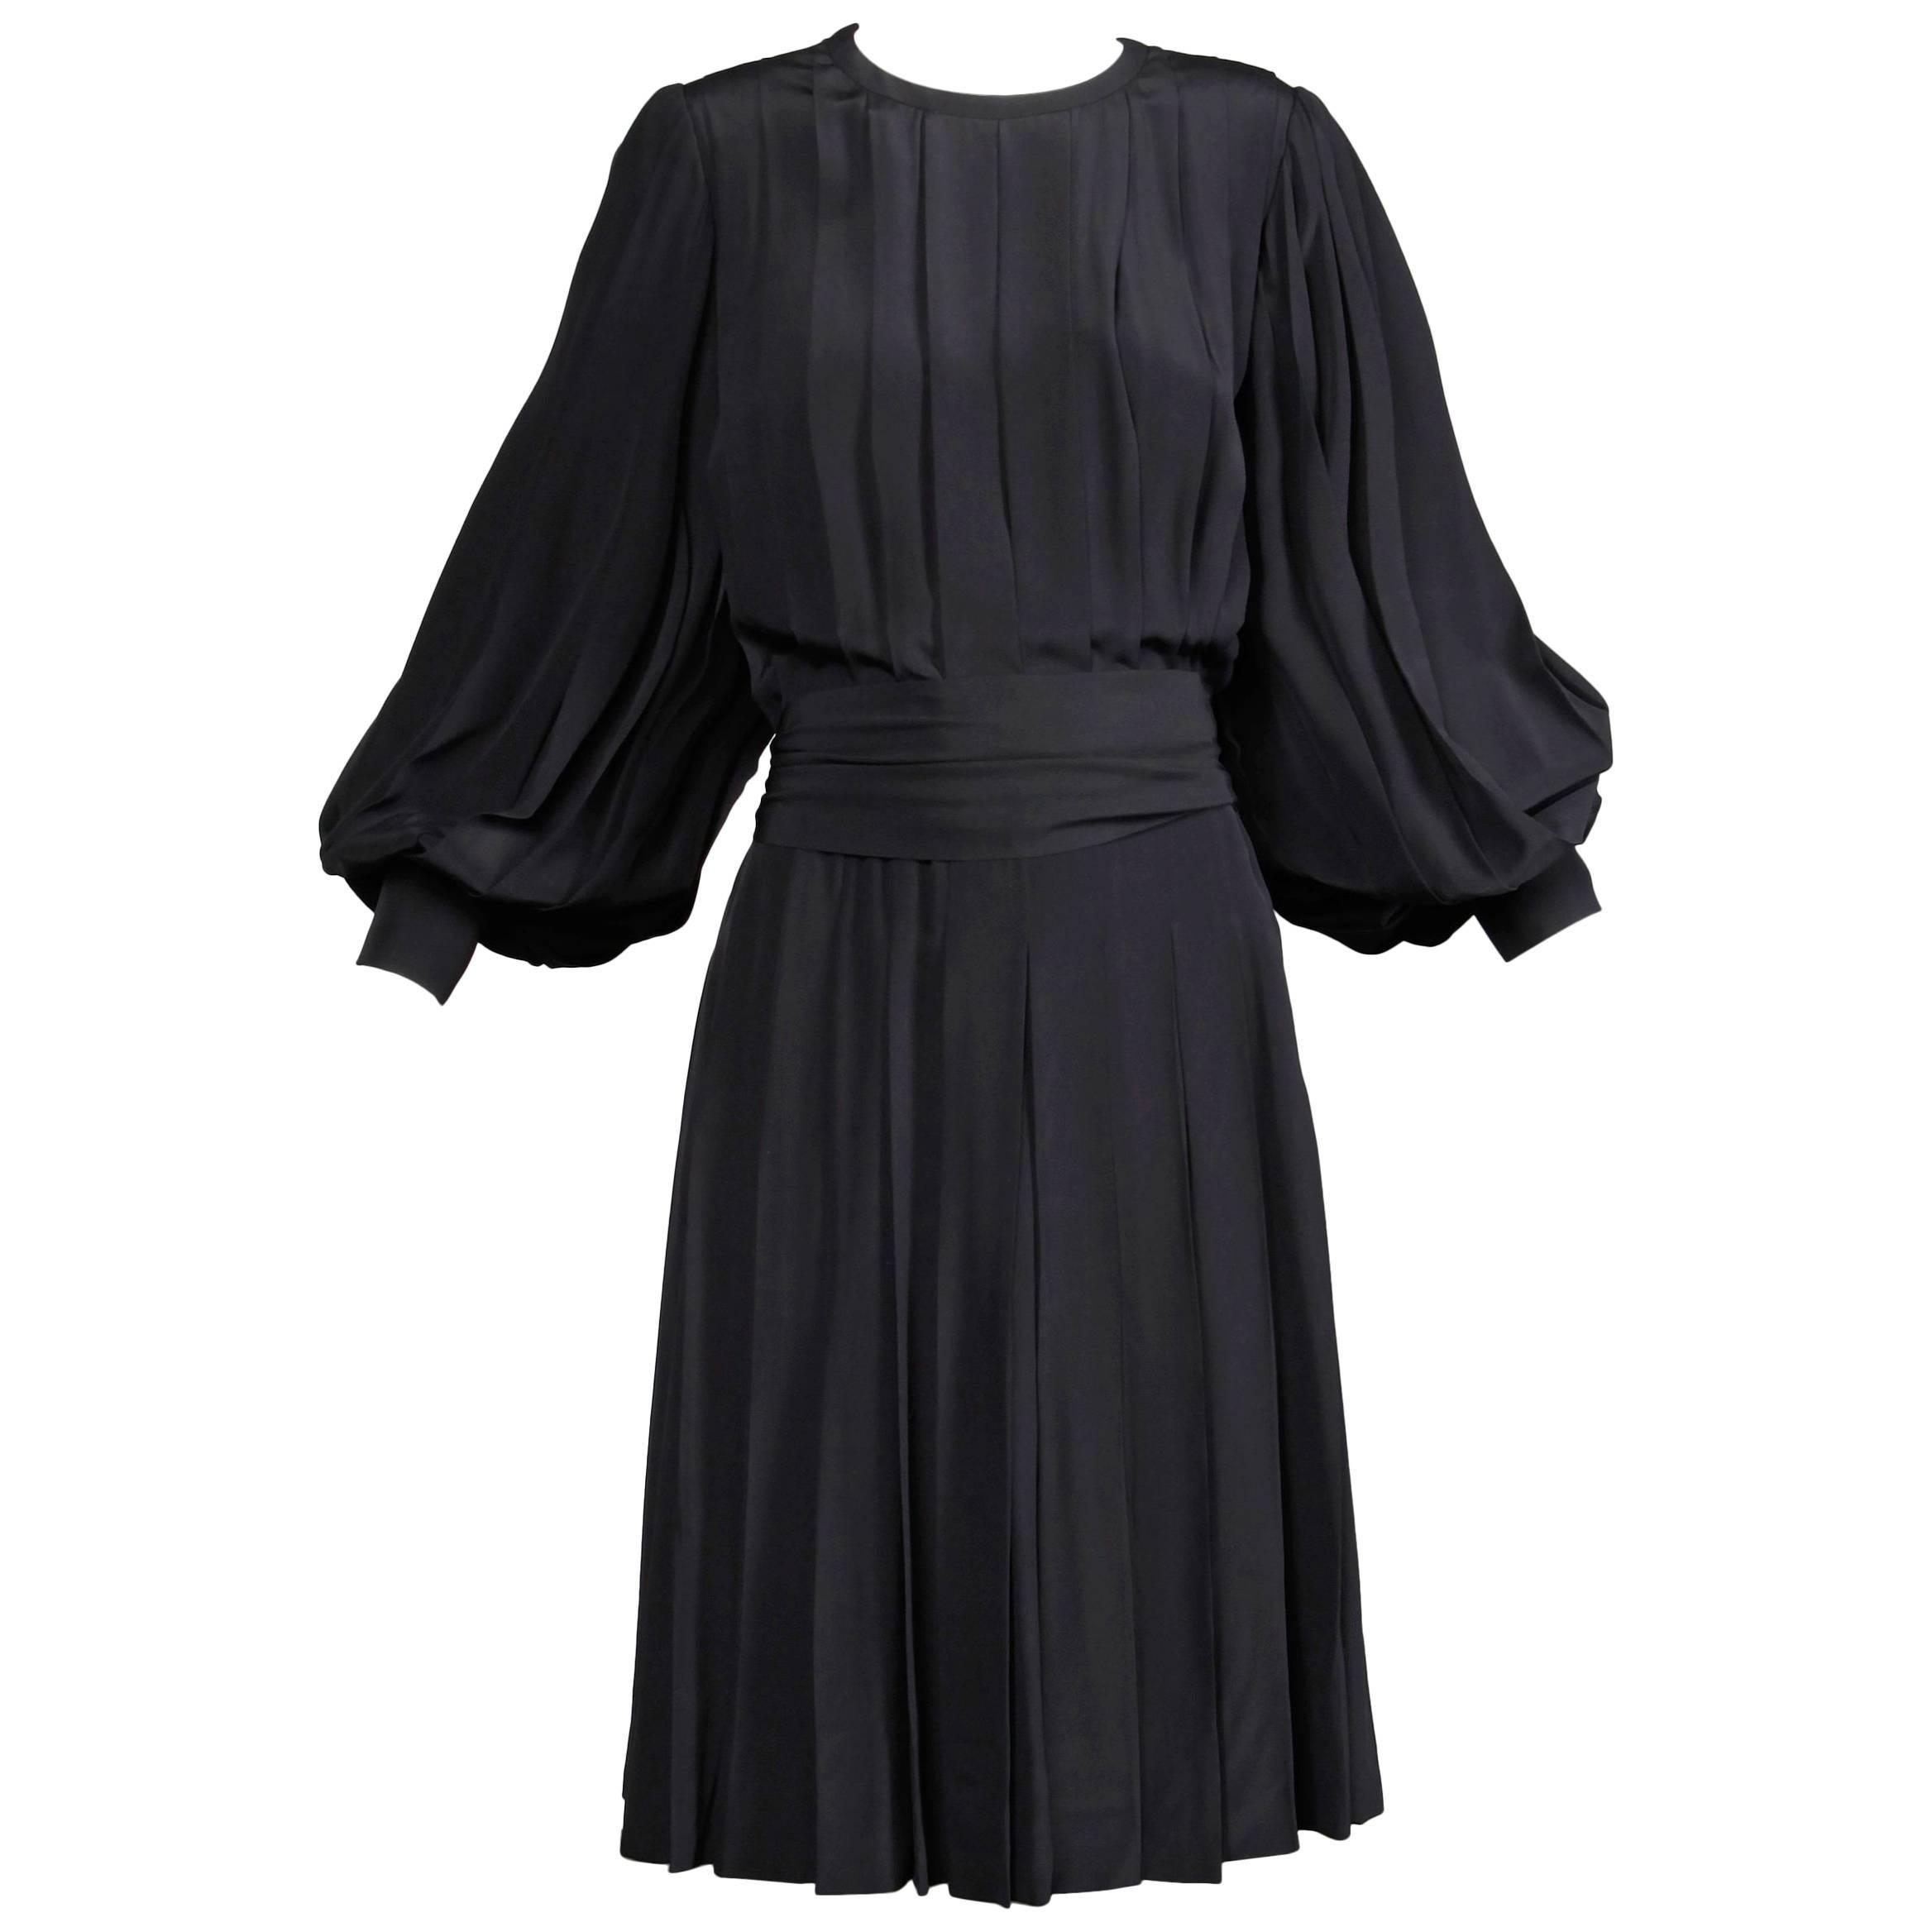 1980s Andre Laug Vintage Black Silk Dress with Matching Sash Belt